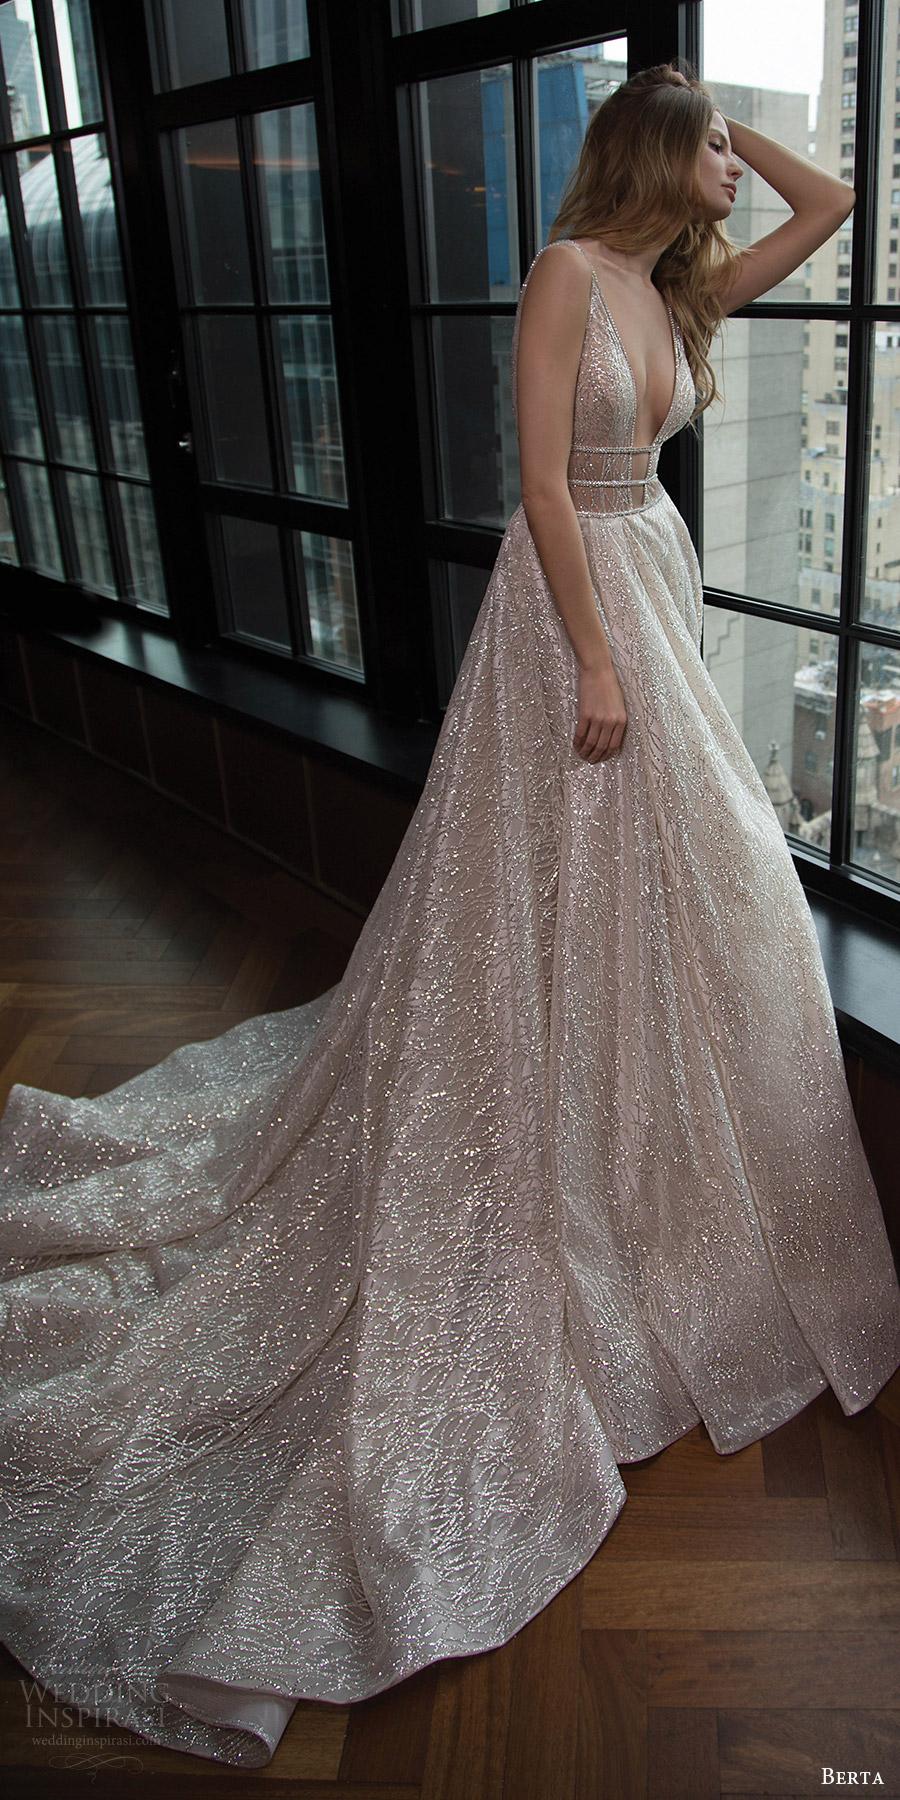 berta bridal fall 2016 sleeveless deep vneck embellished aline wedding dress (16 101) fv